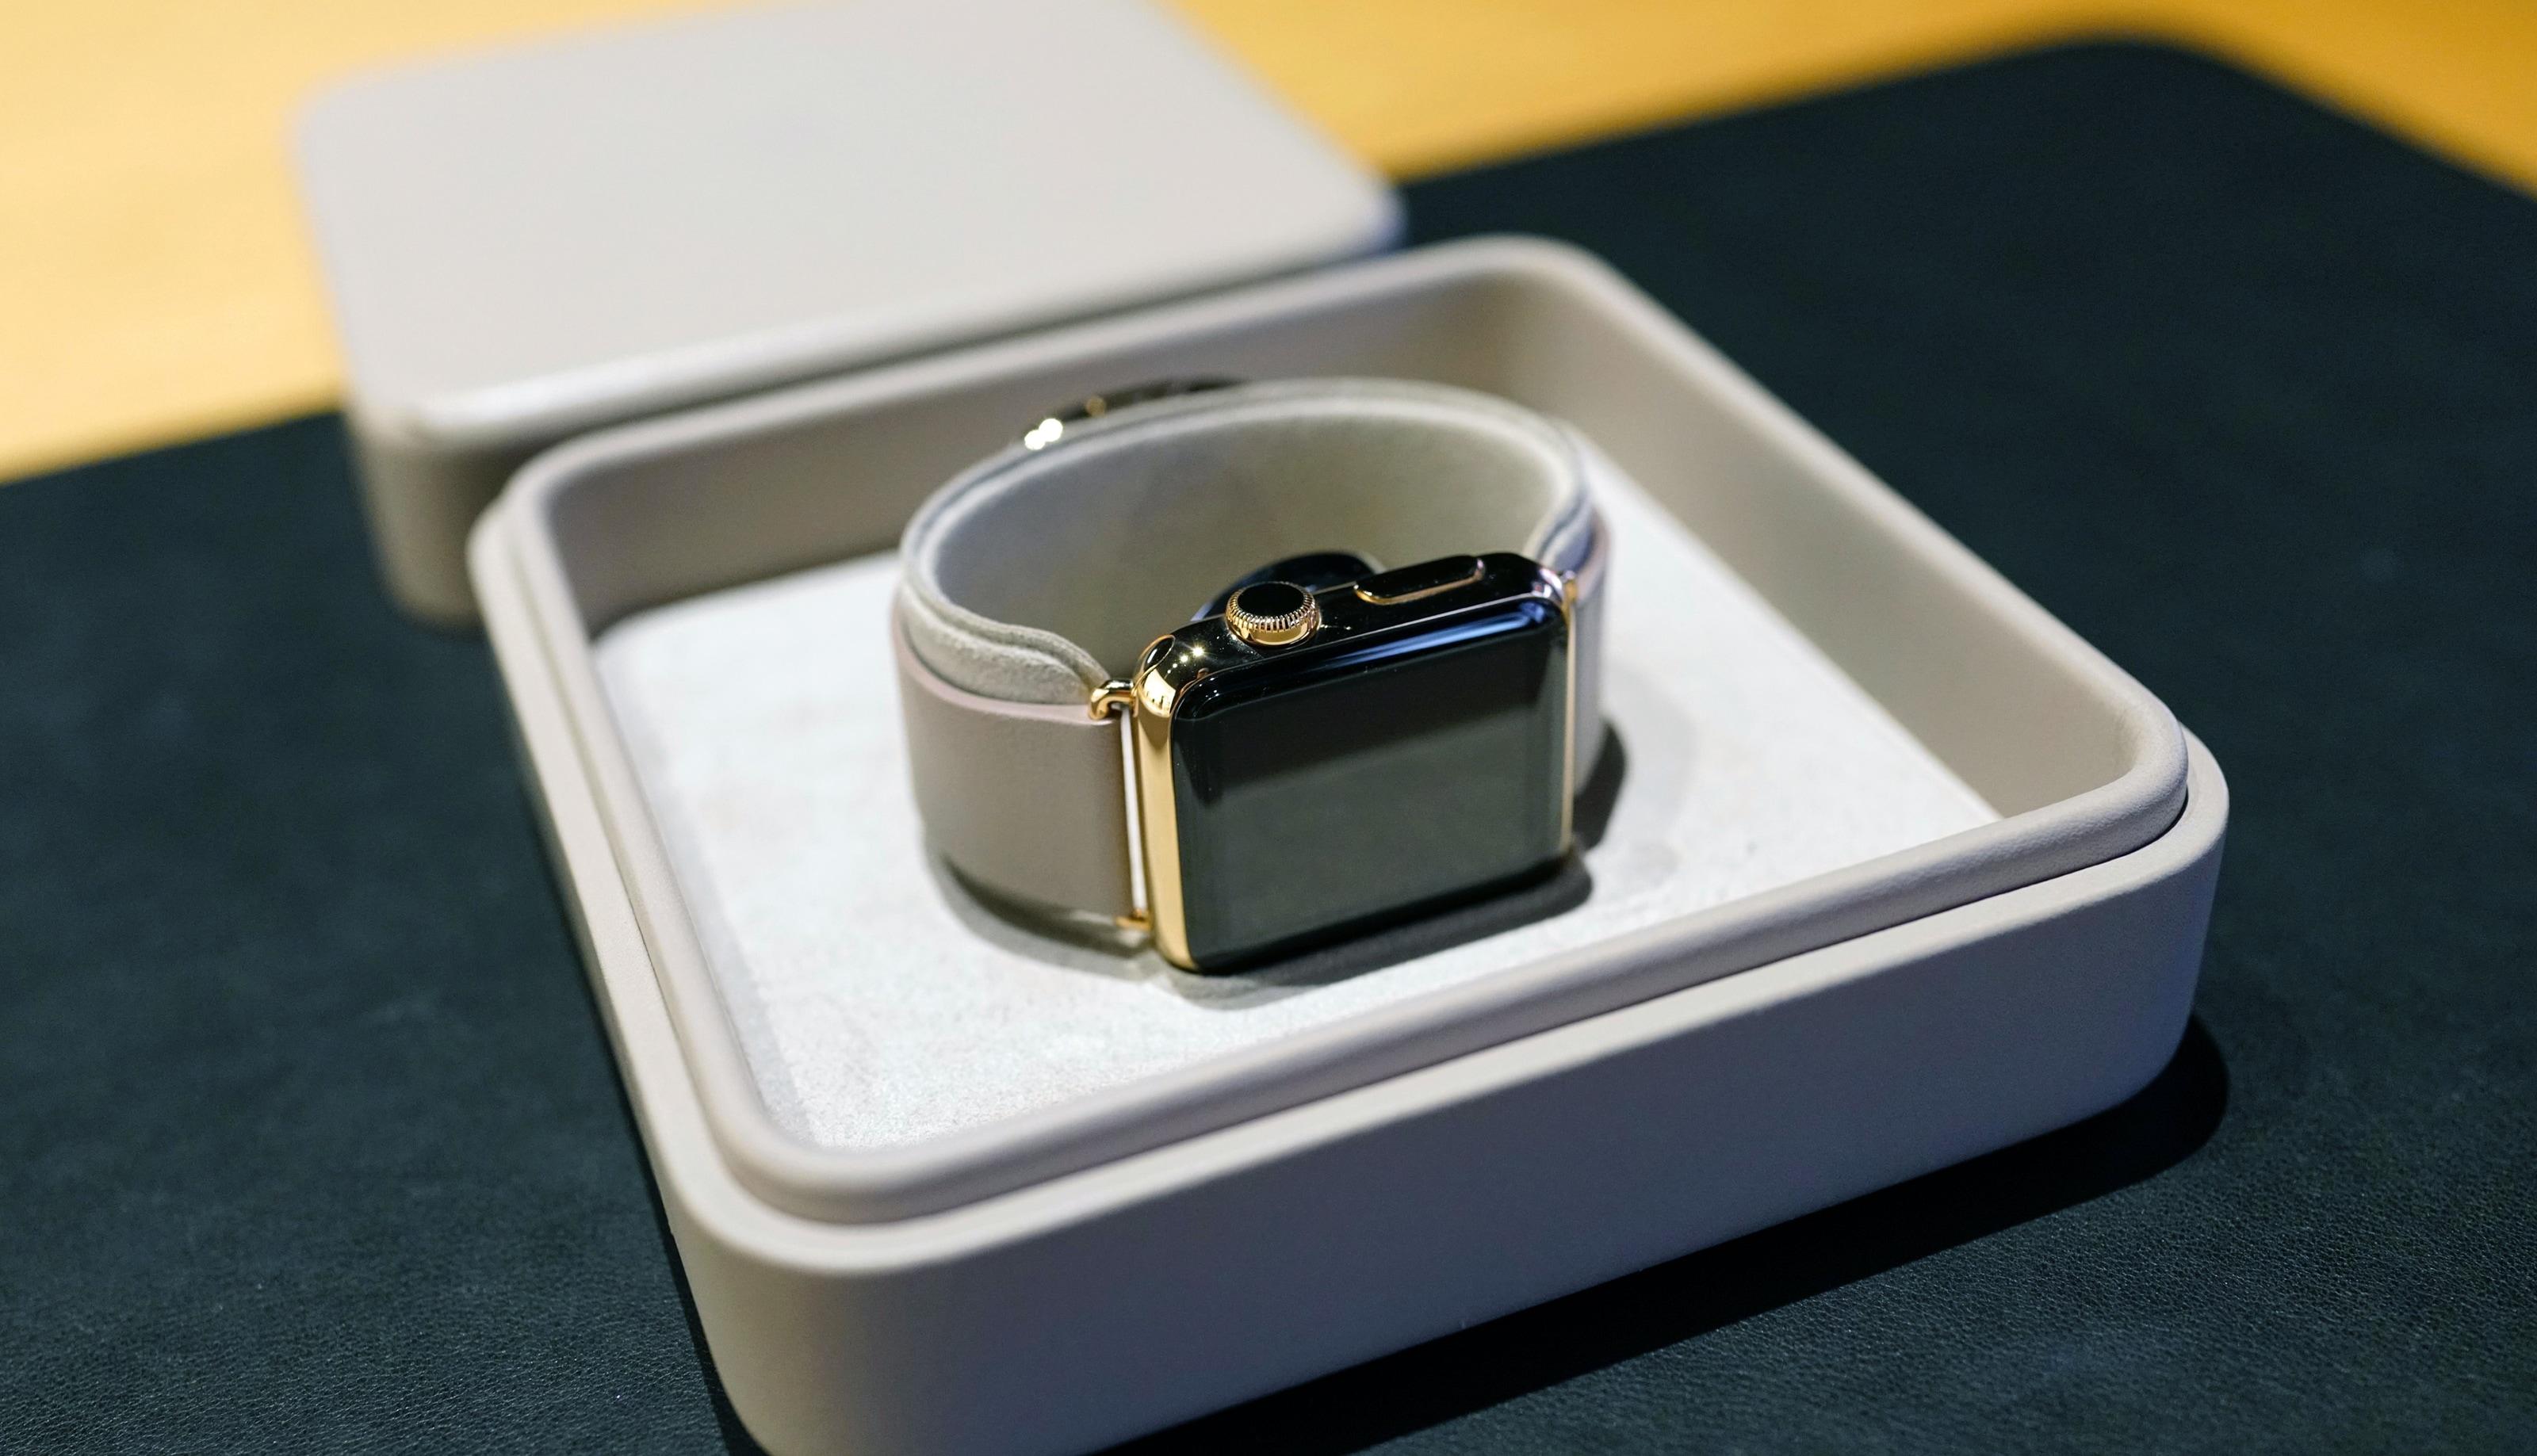 Apple Watch Edition de ouro ainda à venda